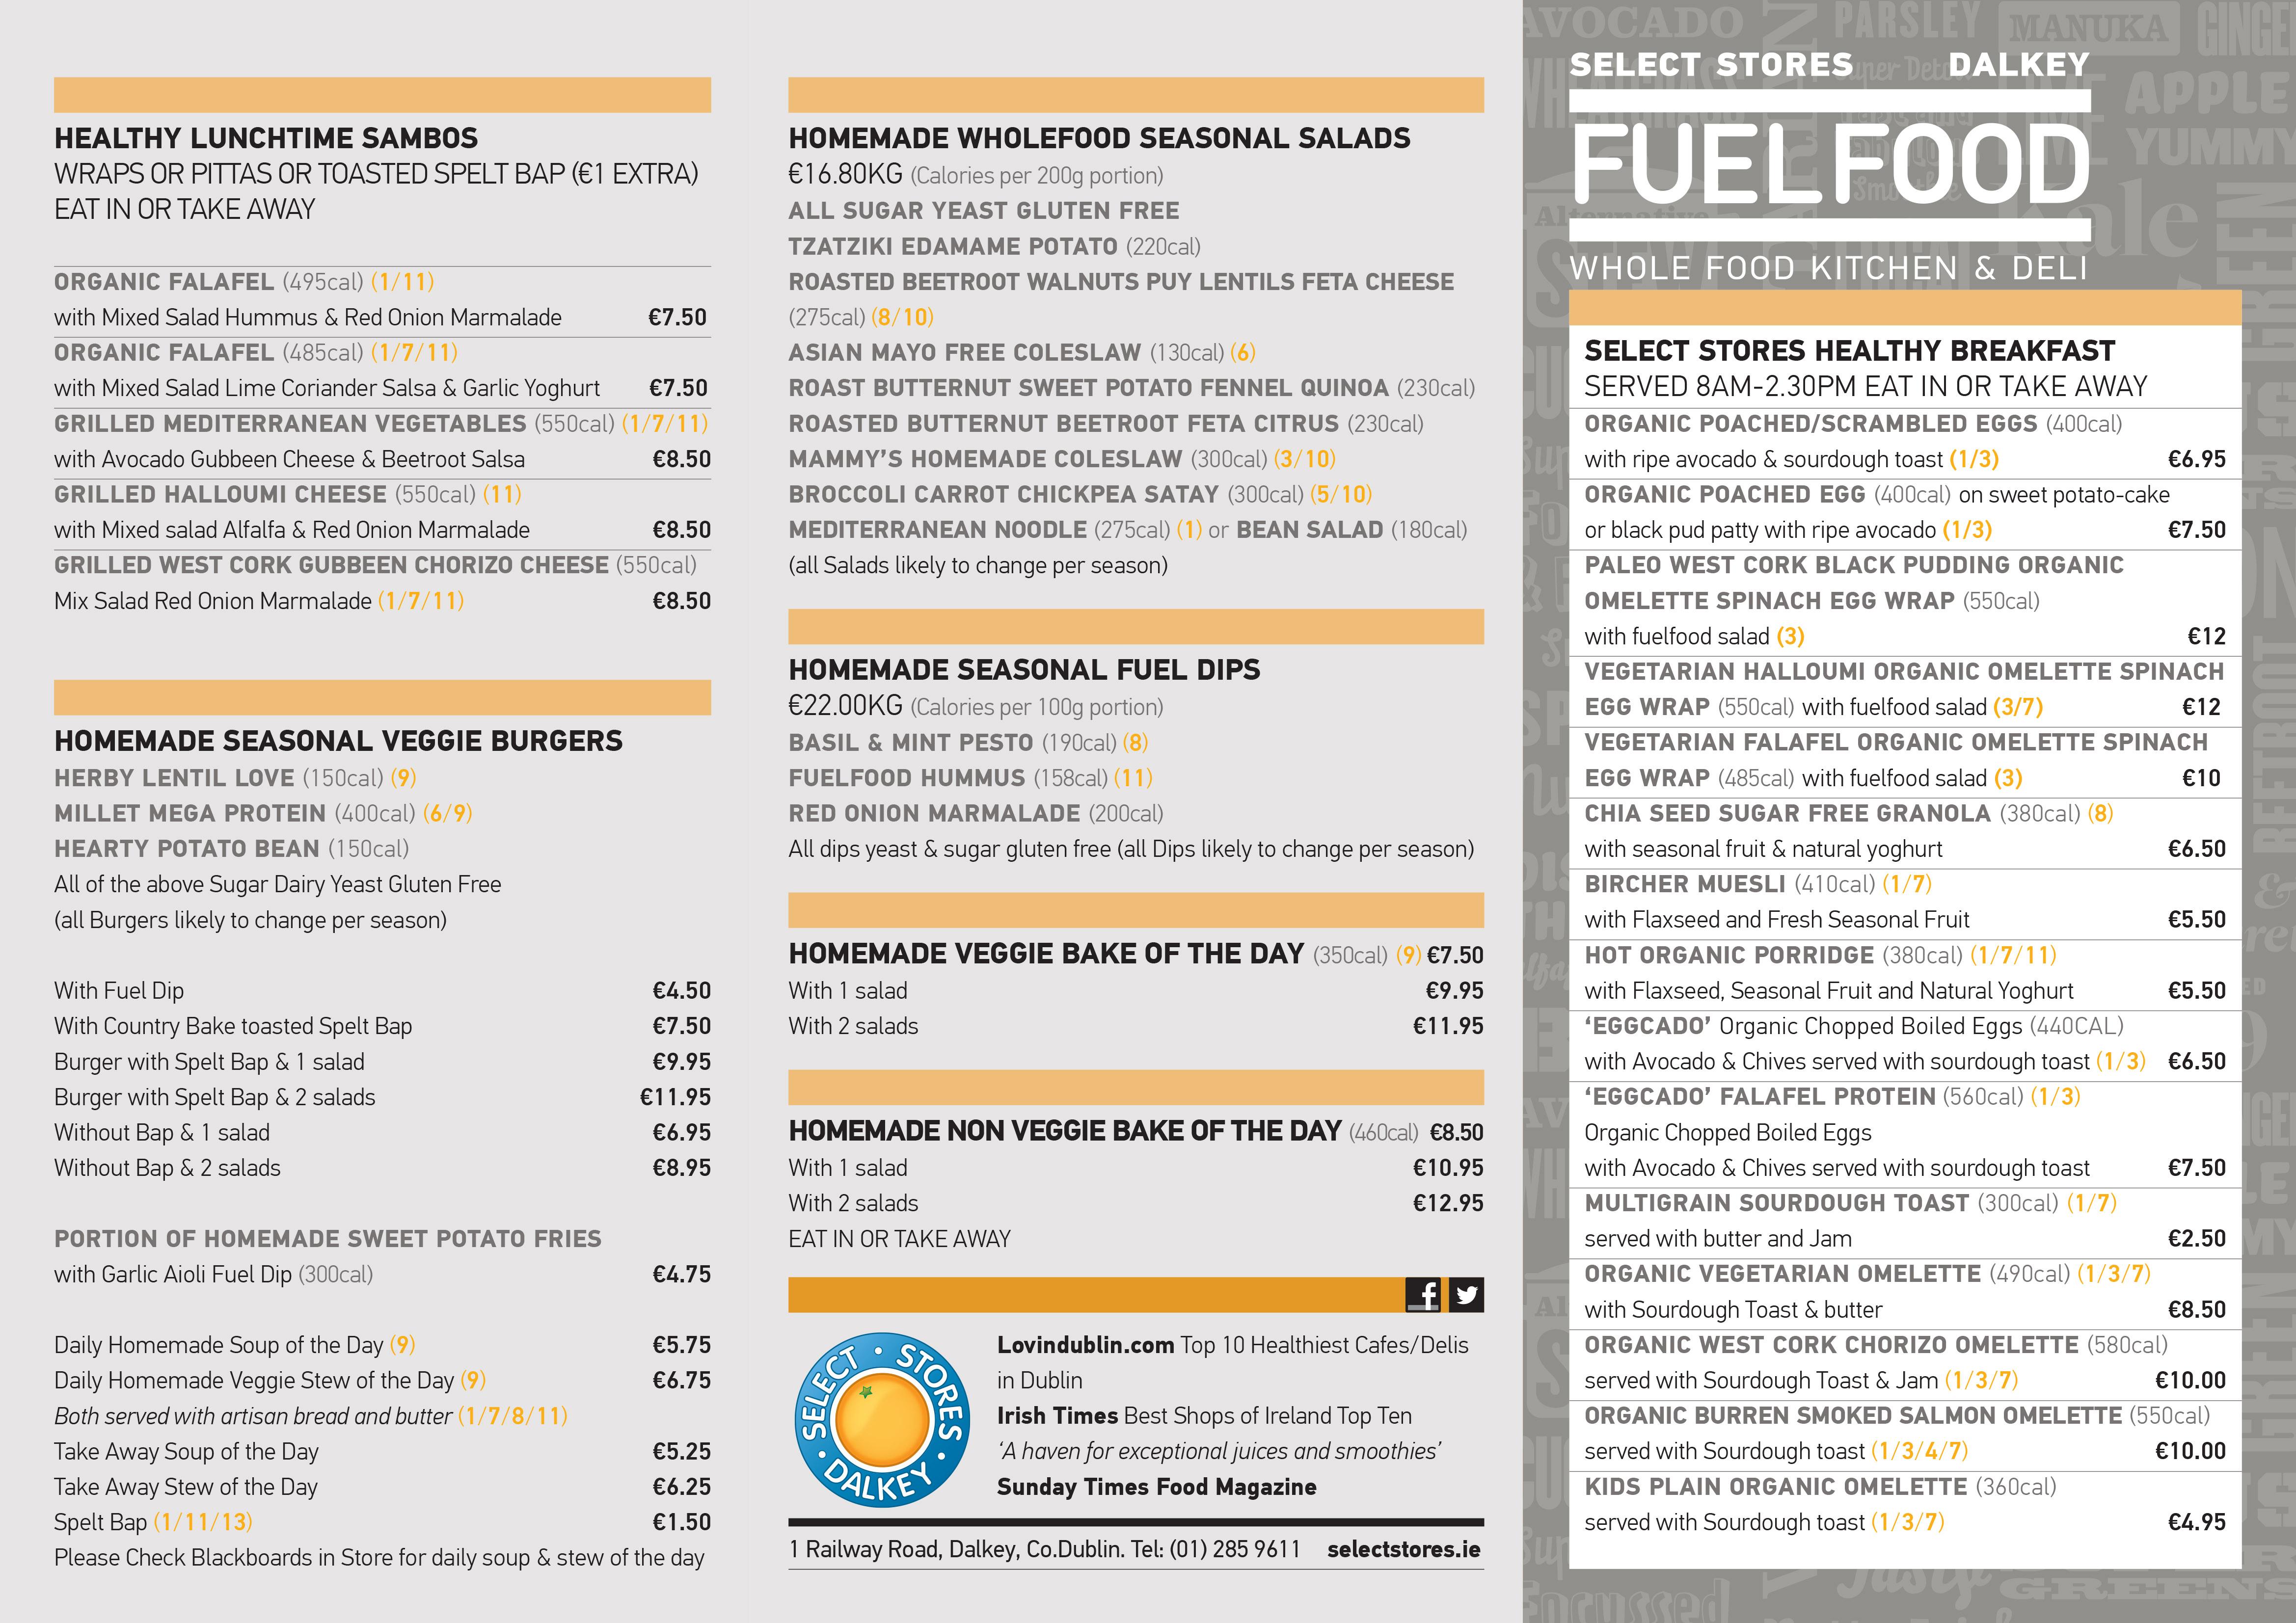 FuelFood-Menu-Feb17.indd